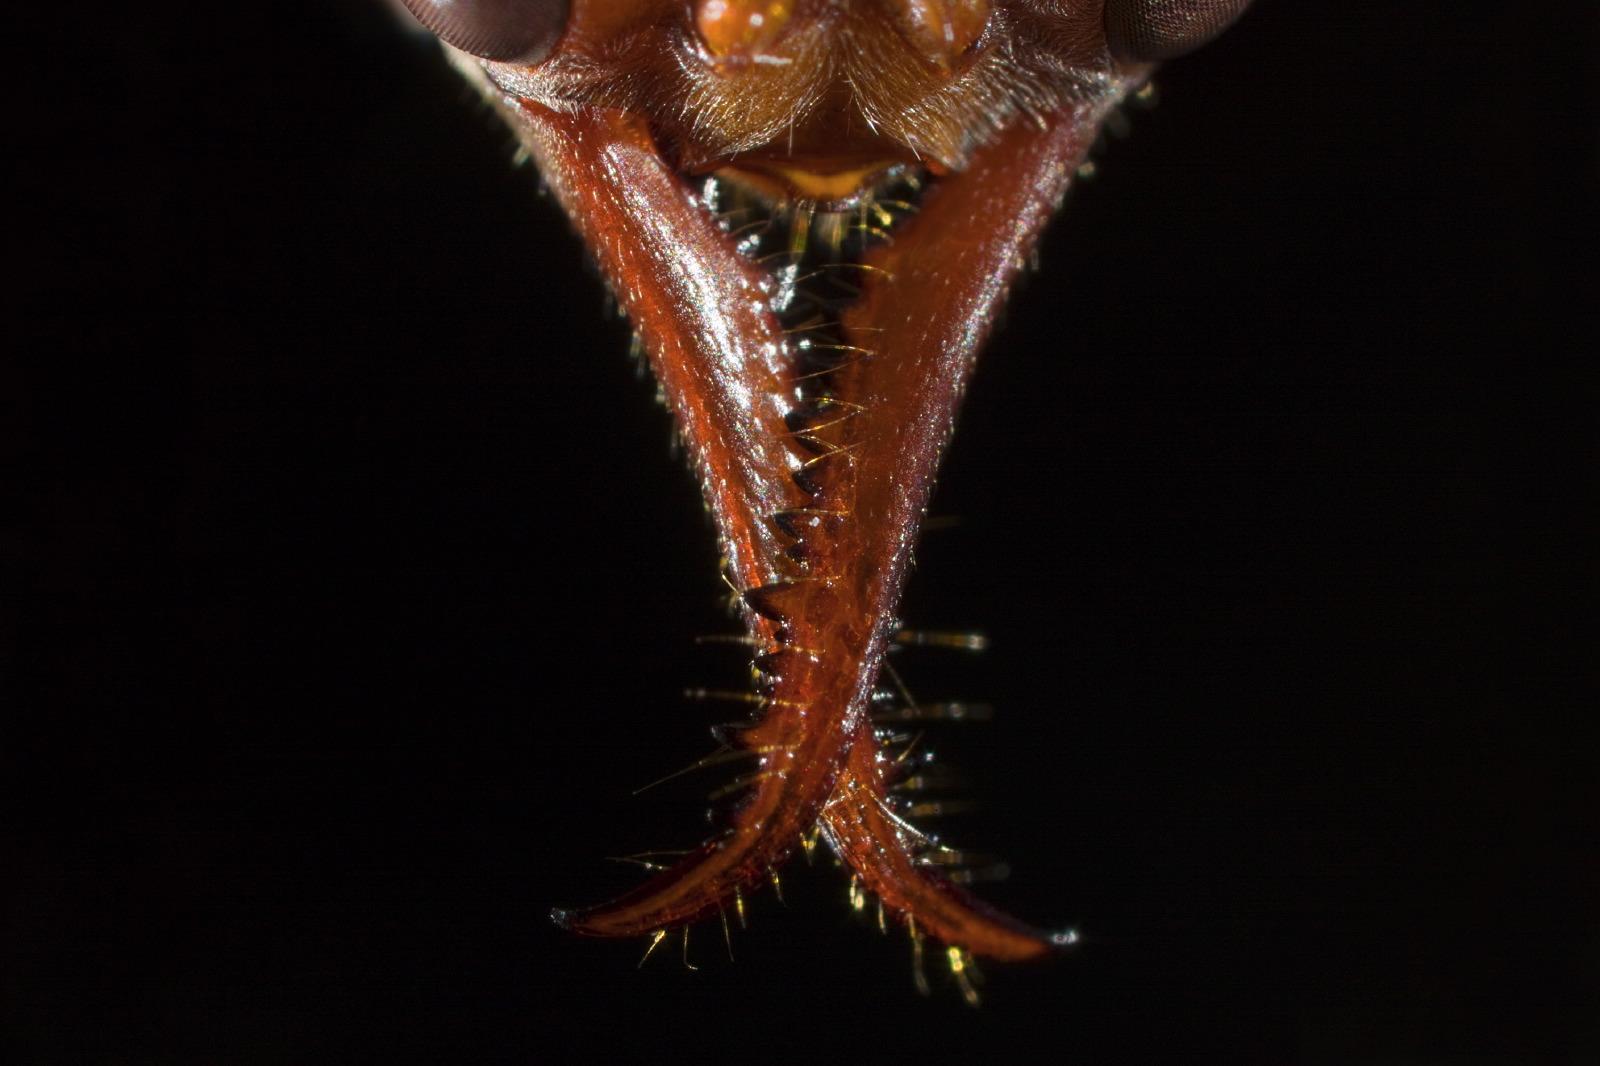 Myrmecia ant mosaic detail mandibles